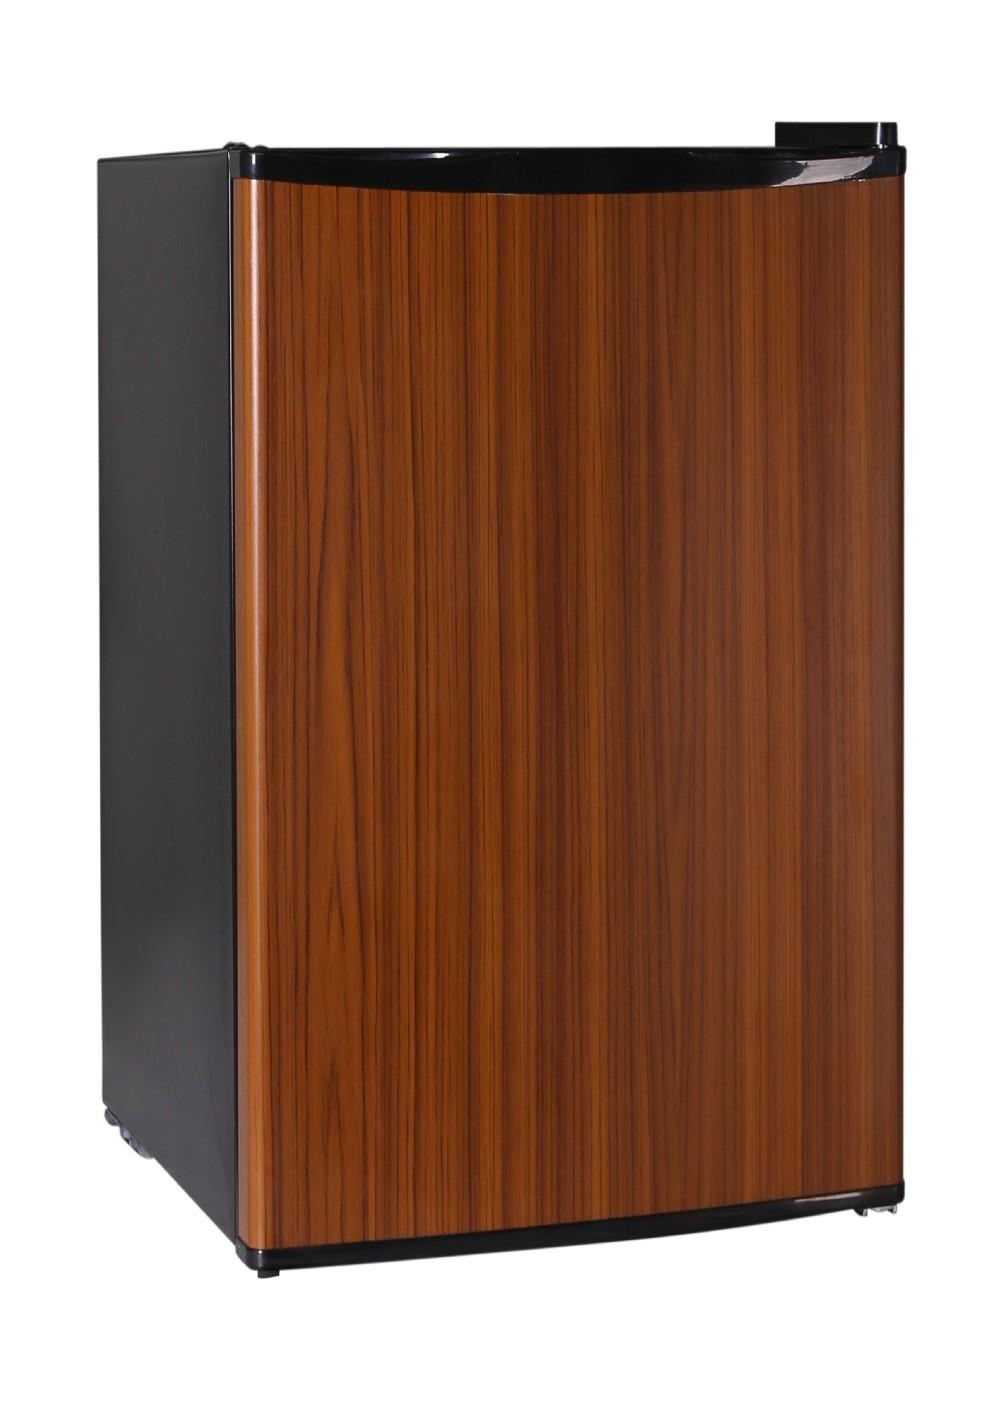 mini single door small size table top compact mobile home fridge freezer buy home fridge. Black Bedroom Furniture Sets. Home Design Ideas